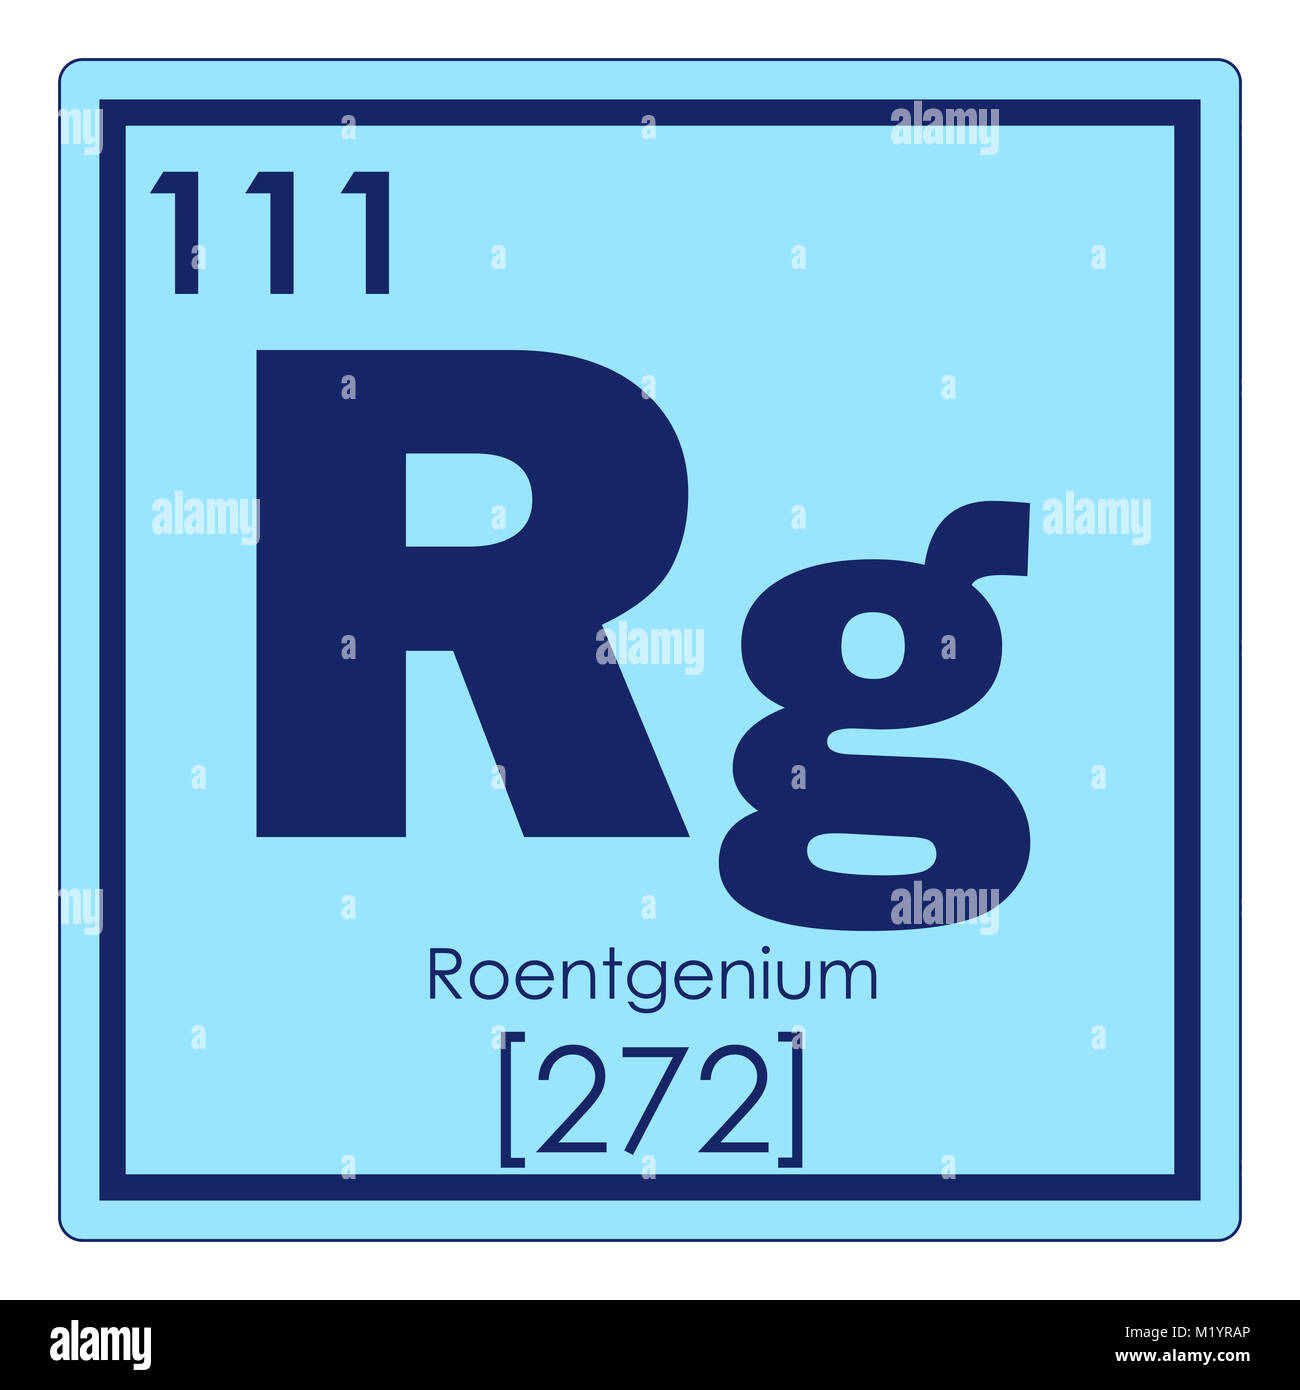 Roentgenium imgenes de stock roentgenium fotos de stock alamy tabla peridica de elementos qumicos roentgenium smbolo de ciencia imagen de stock urtaz Image collections